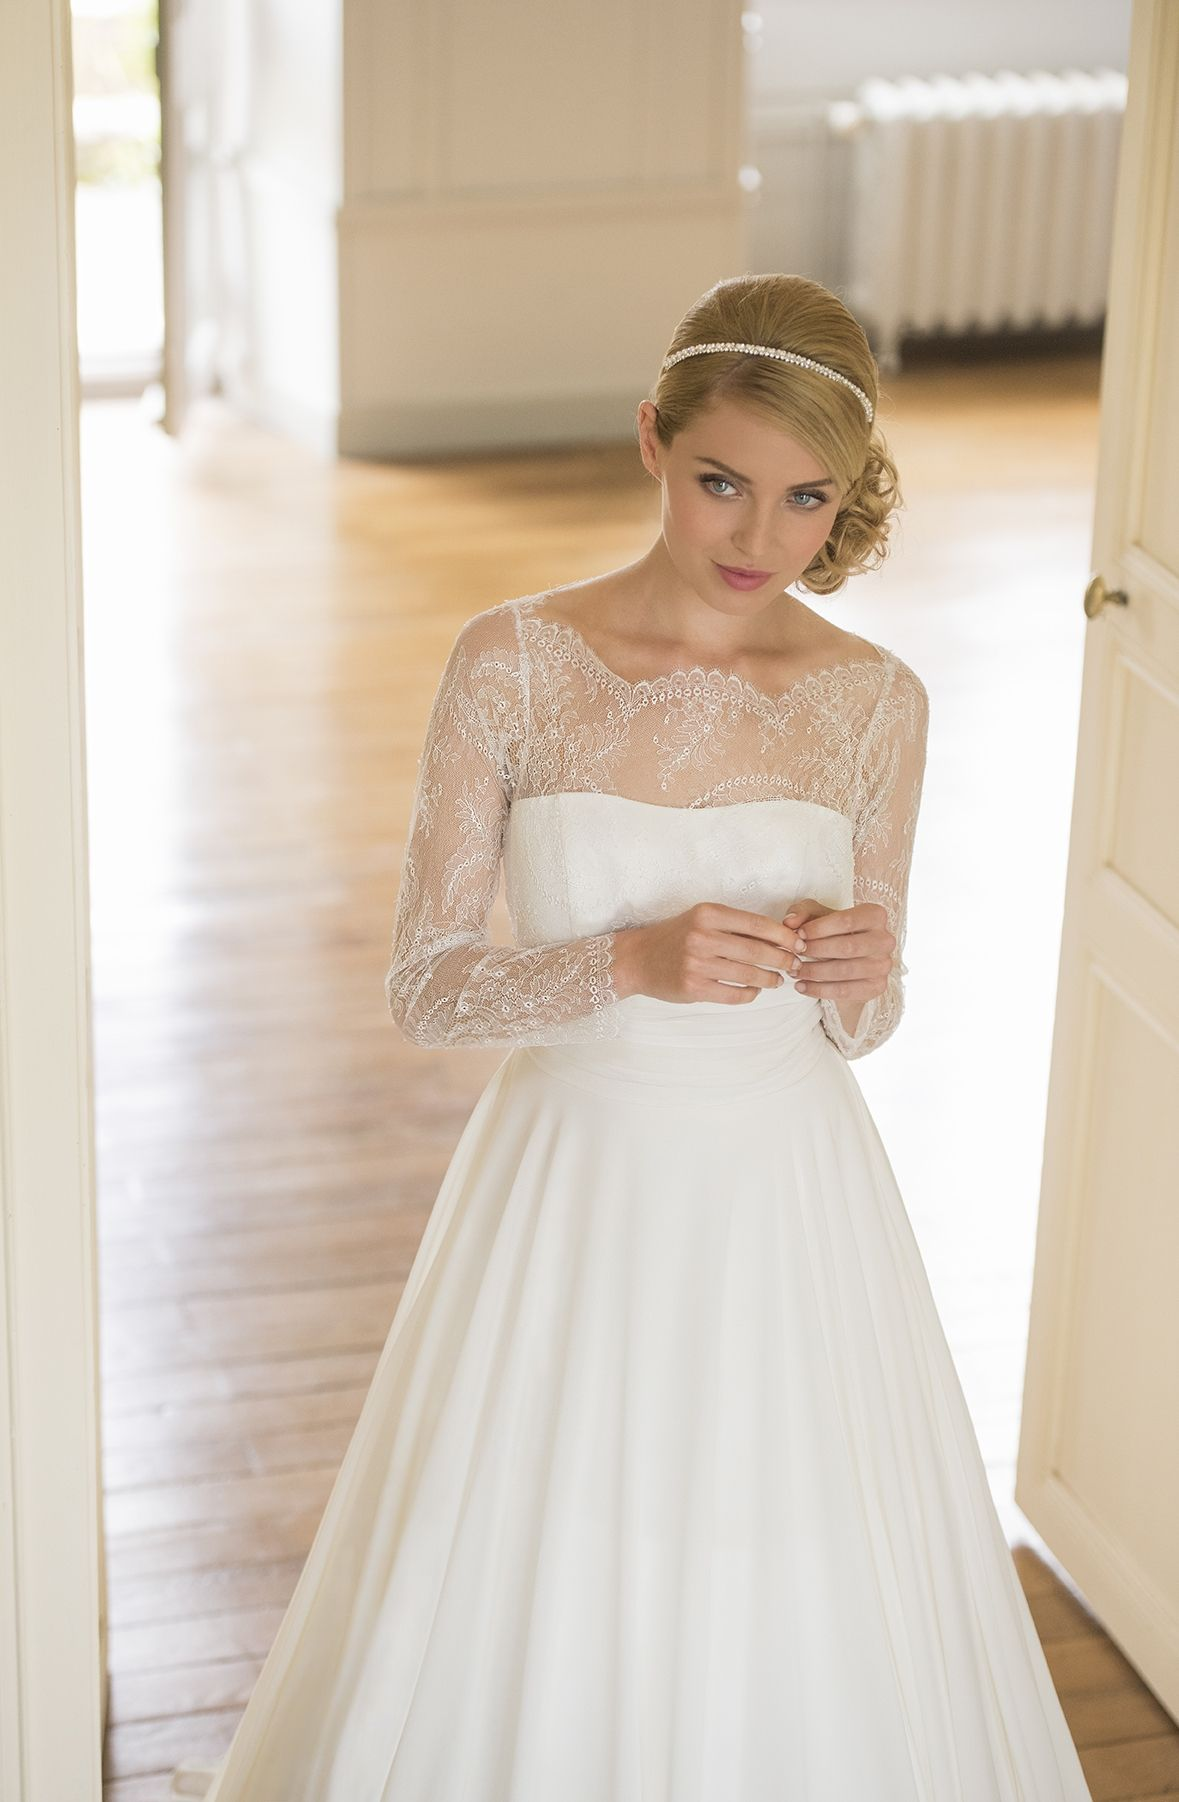 Vestido de noiva de francisco réli flanelle corte princesa